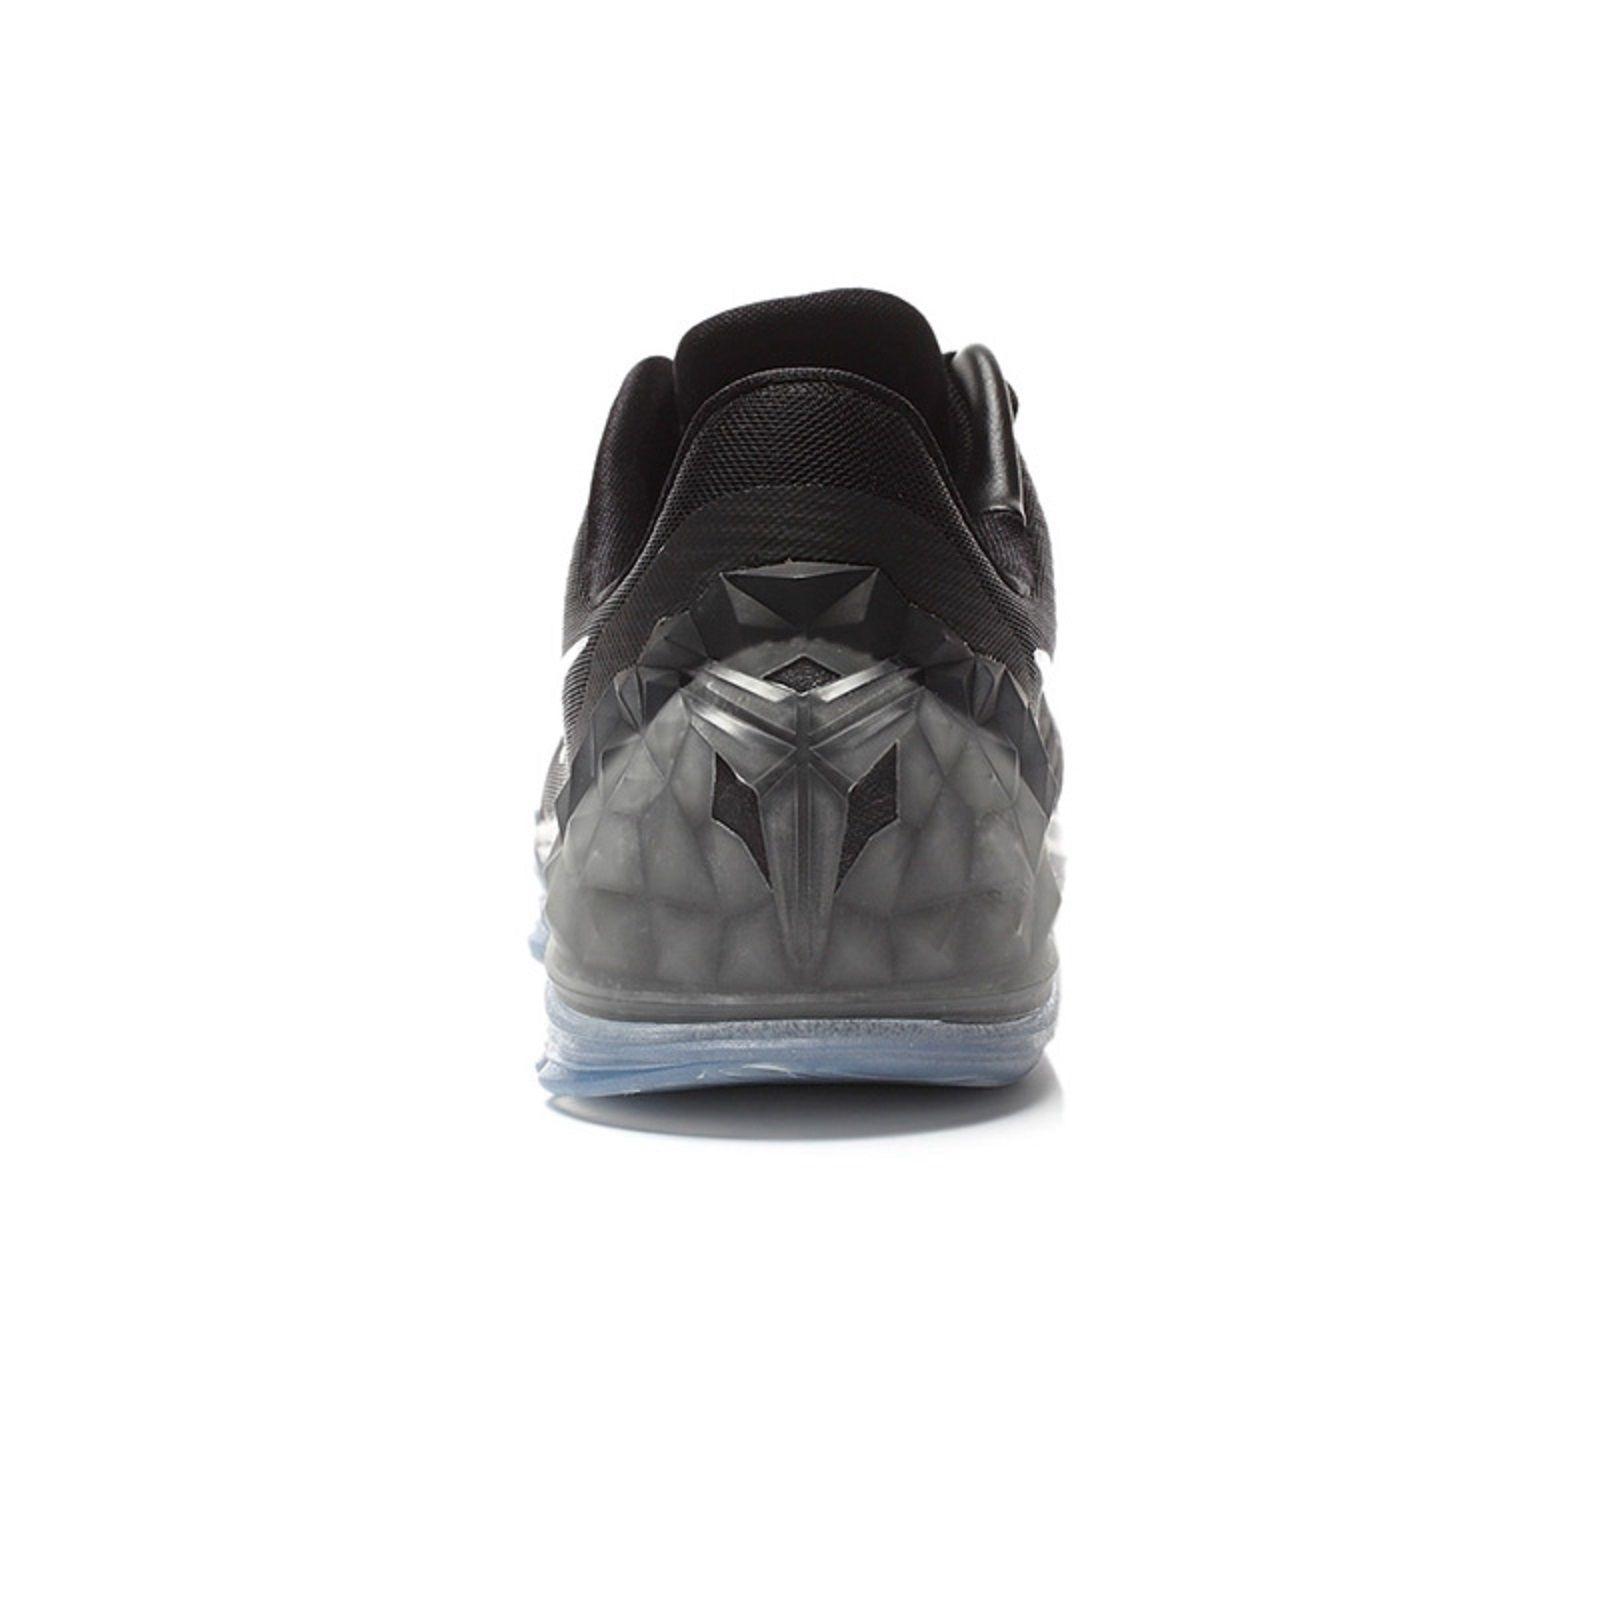 reputable site 5d225 b794e ... Nike Zoom Kobe Venomenon 5 EP Limit Black Basketball Shoes ...